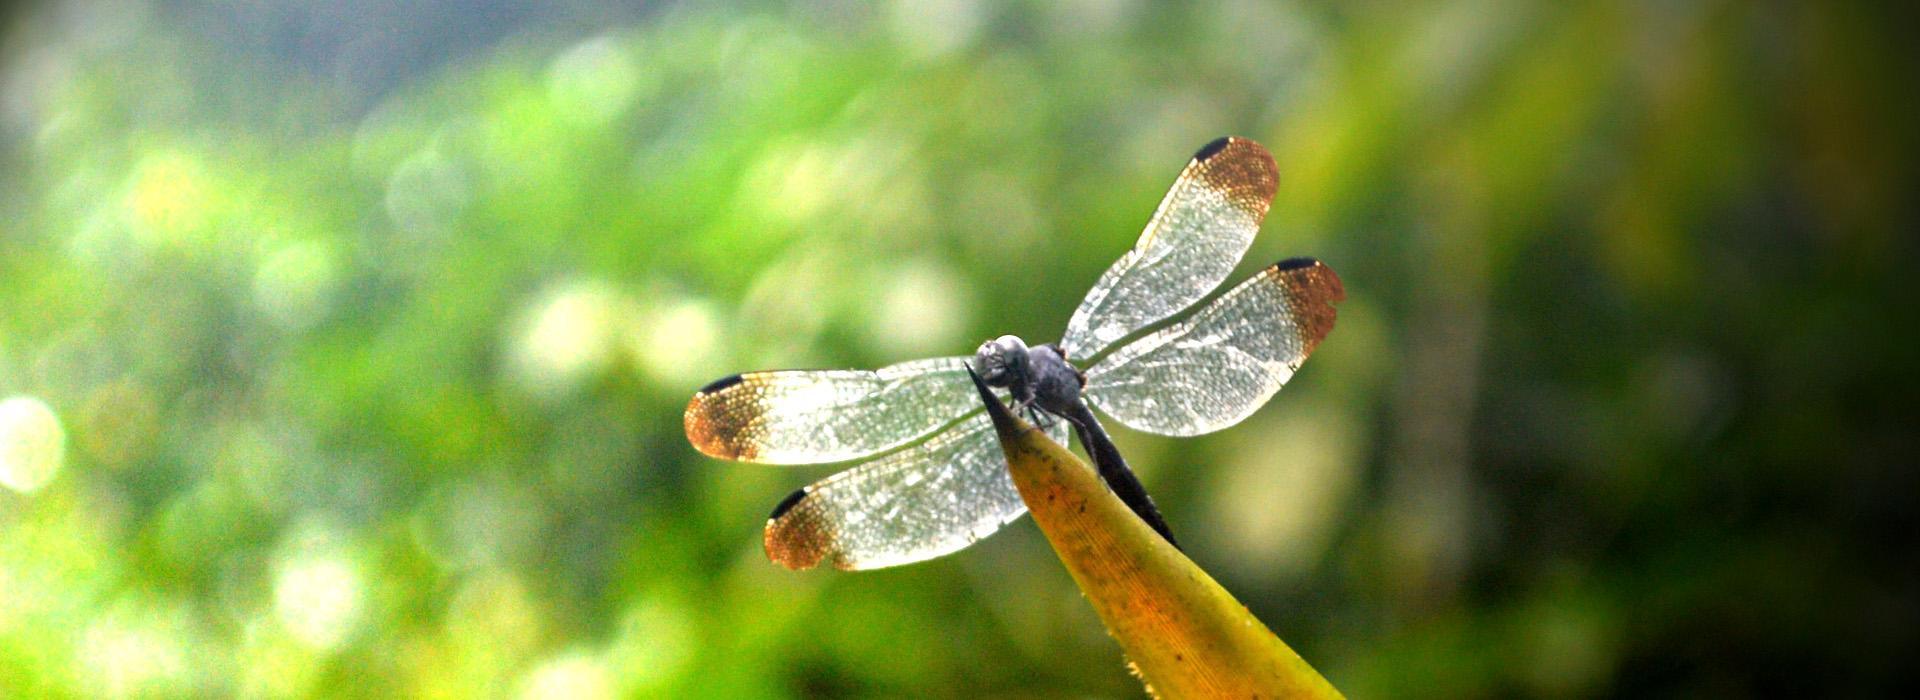 volunteerdragonfly